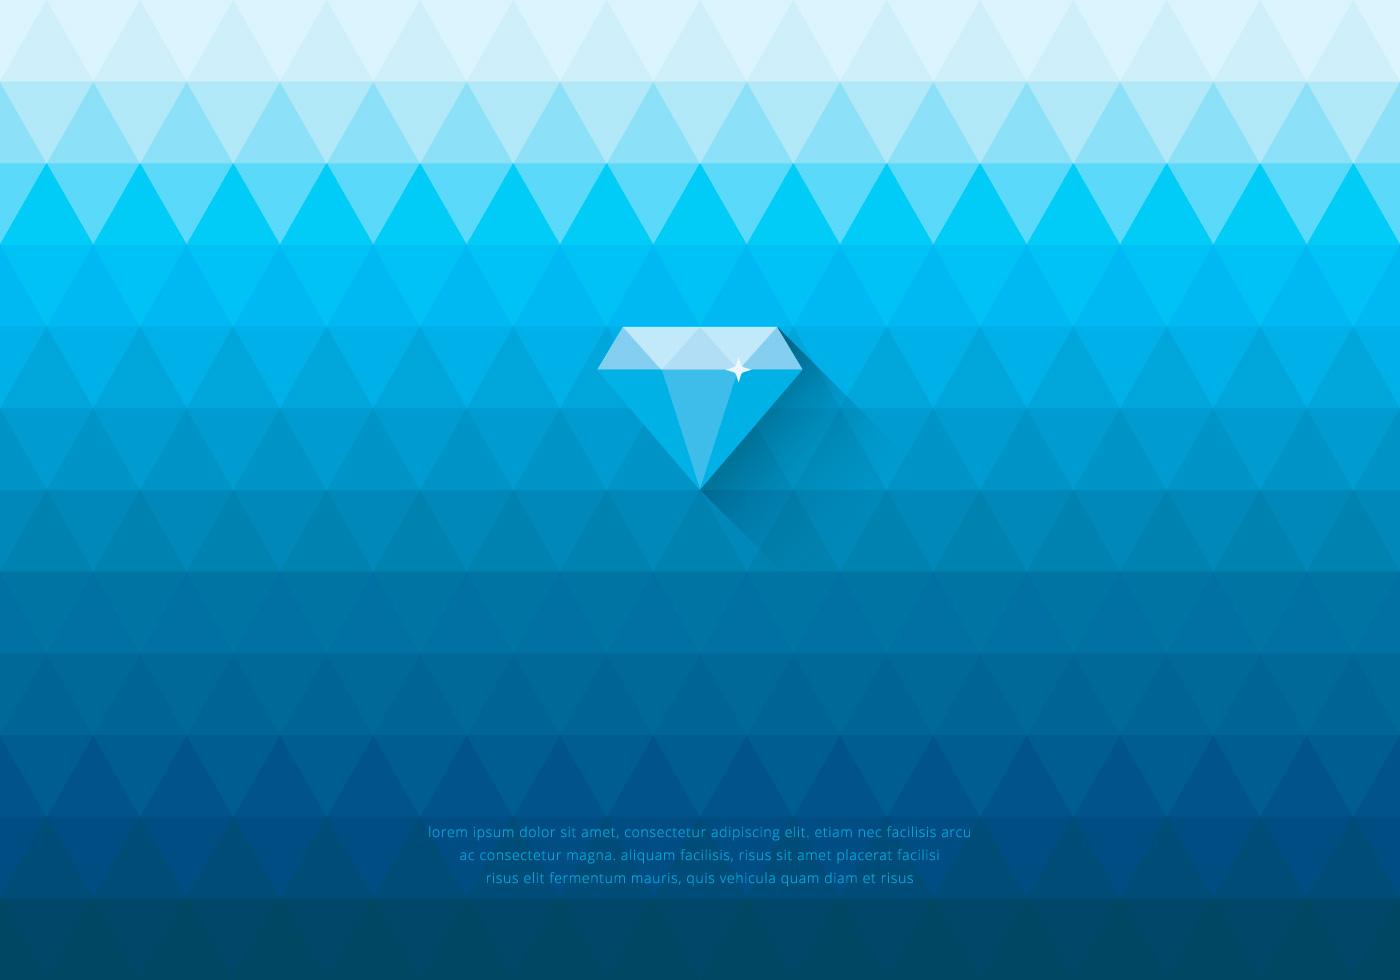 Blue Rhinestone Diamond Psd Background Free Photoshop